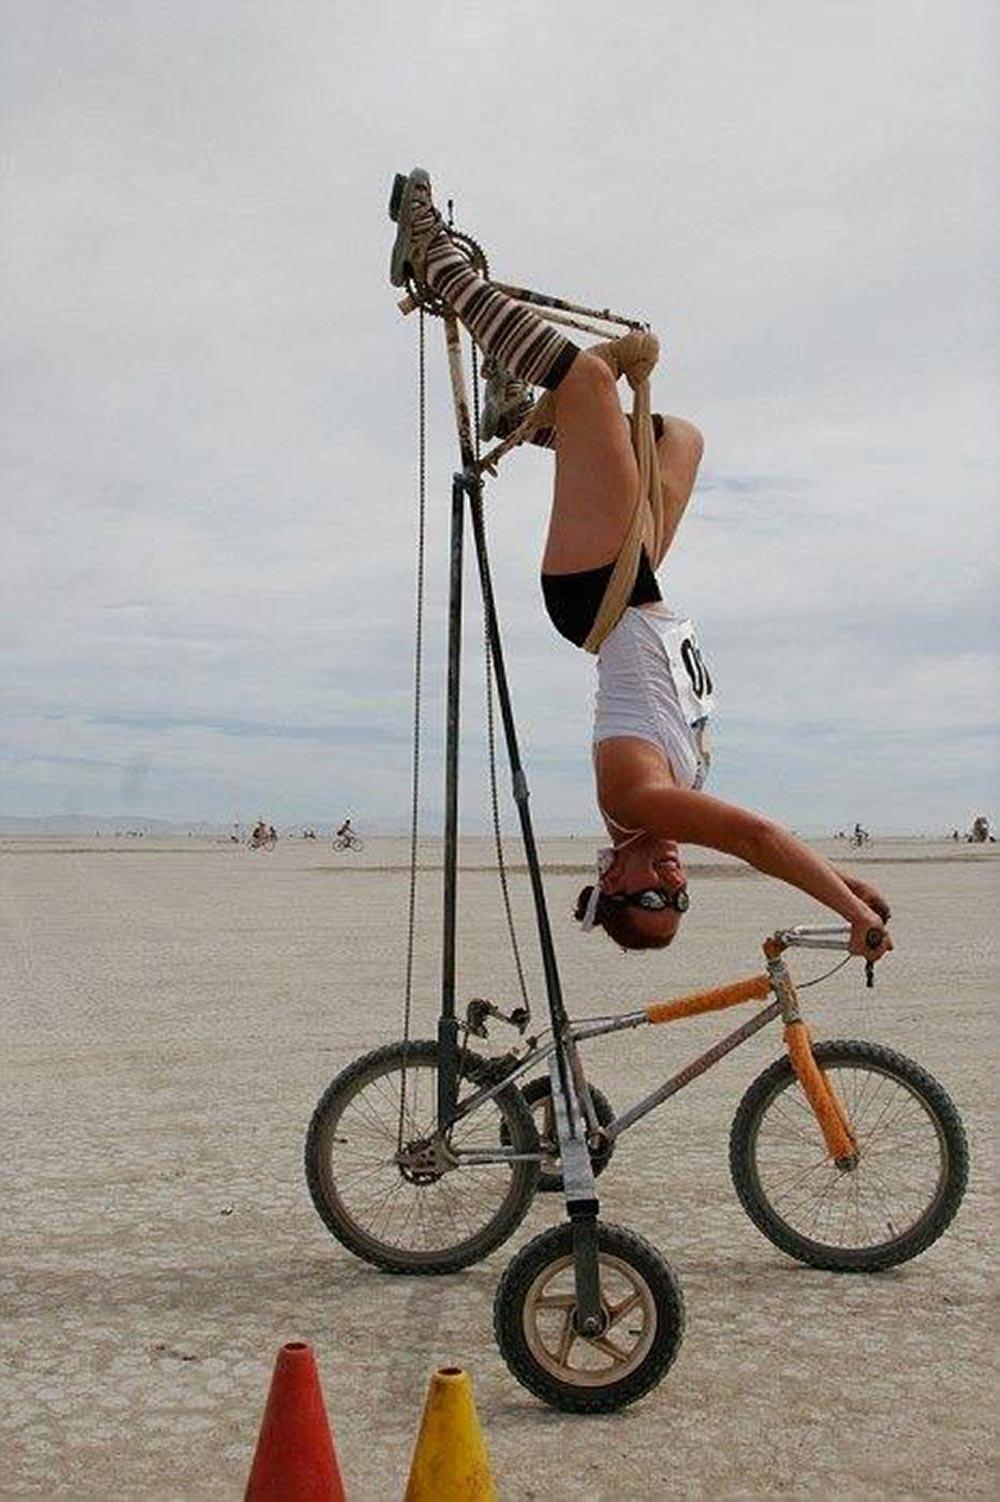 Ragazza a testa in giù su una bici al Burning Man